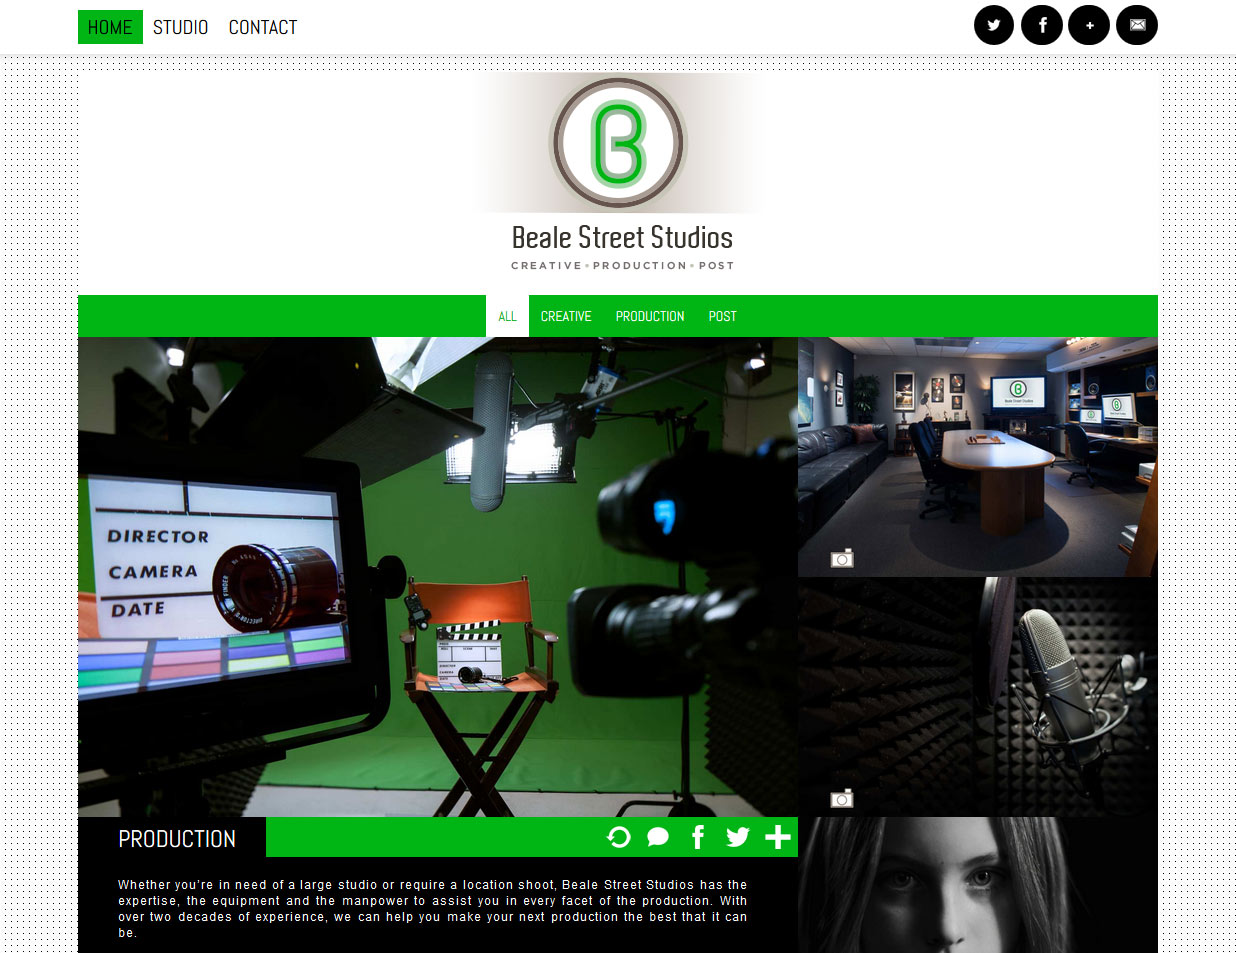 bealestreetstudios.com